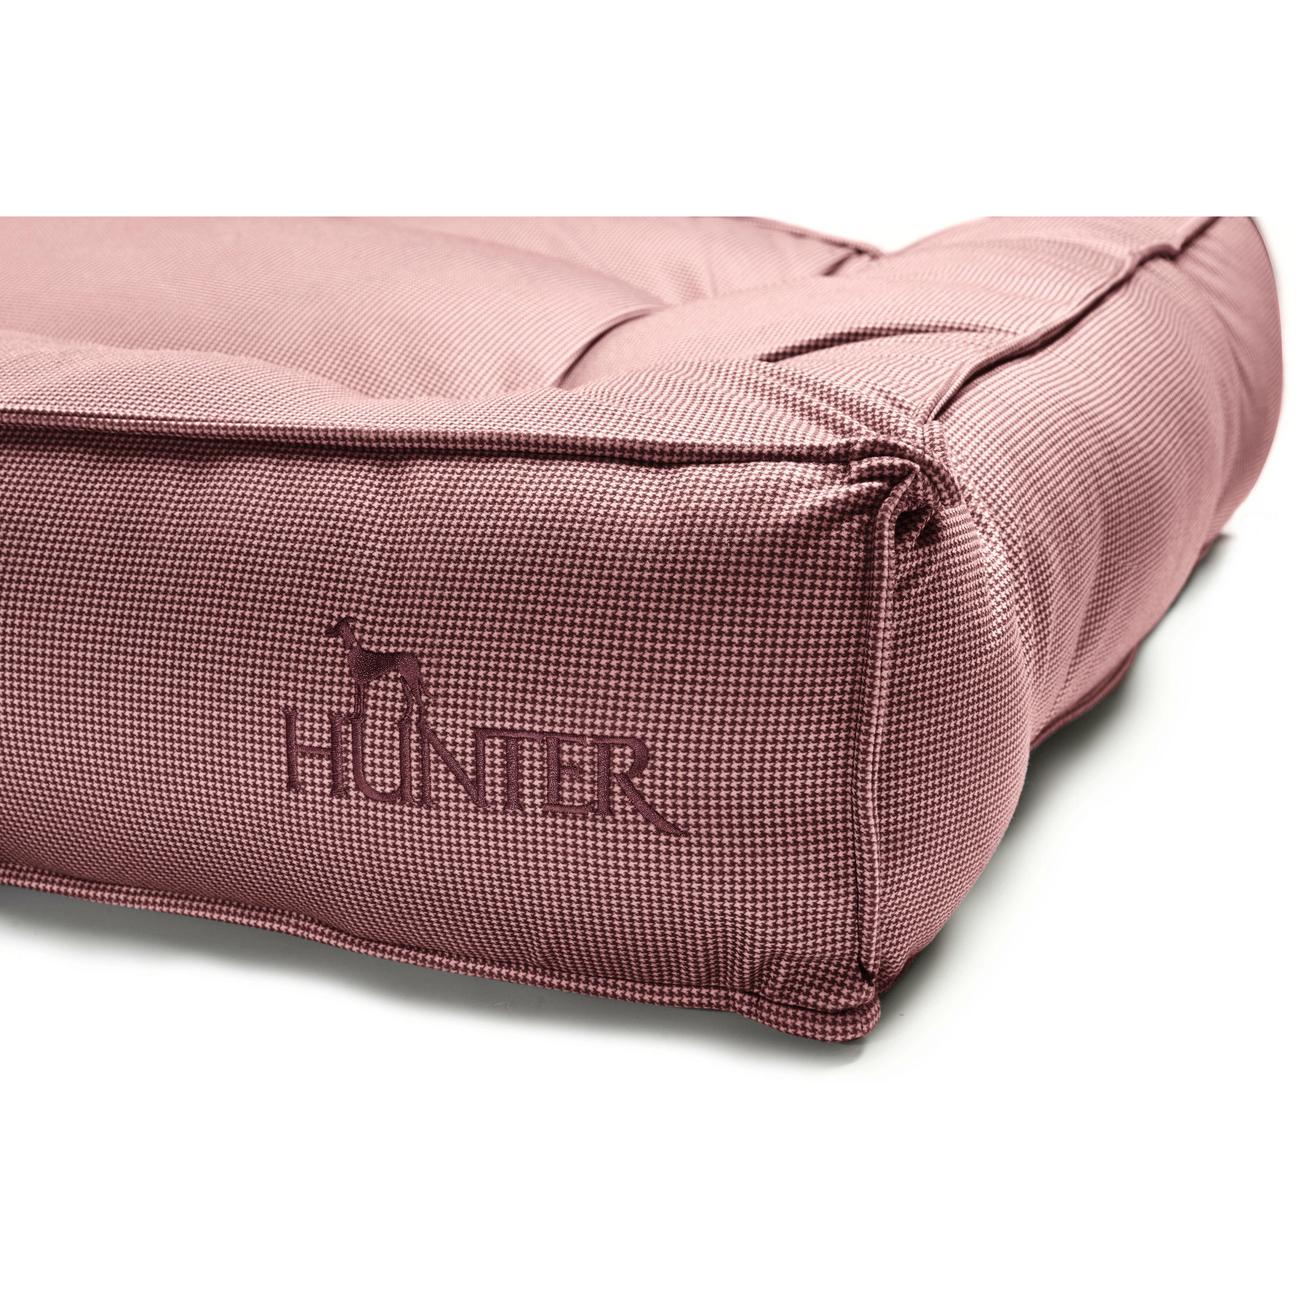 Hunter Hundebett Lancaster 65057, Bild 5